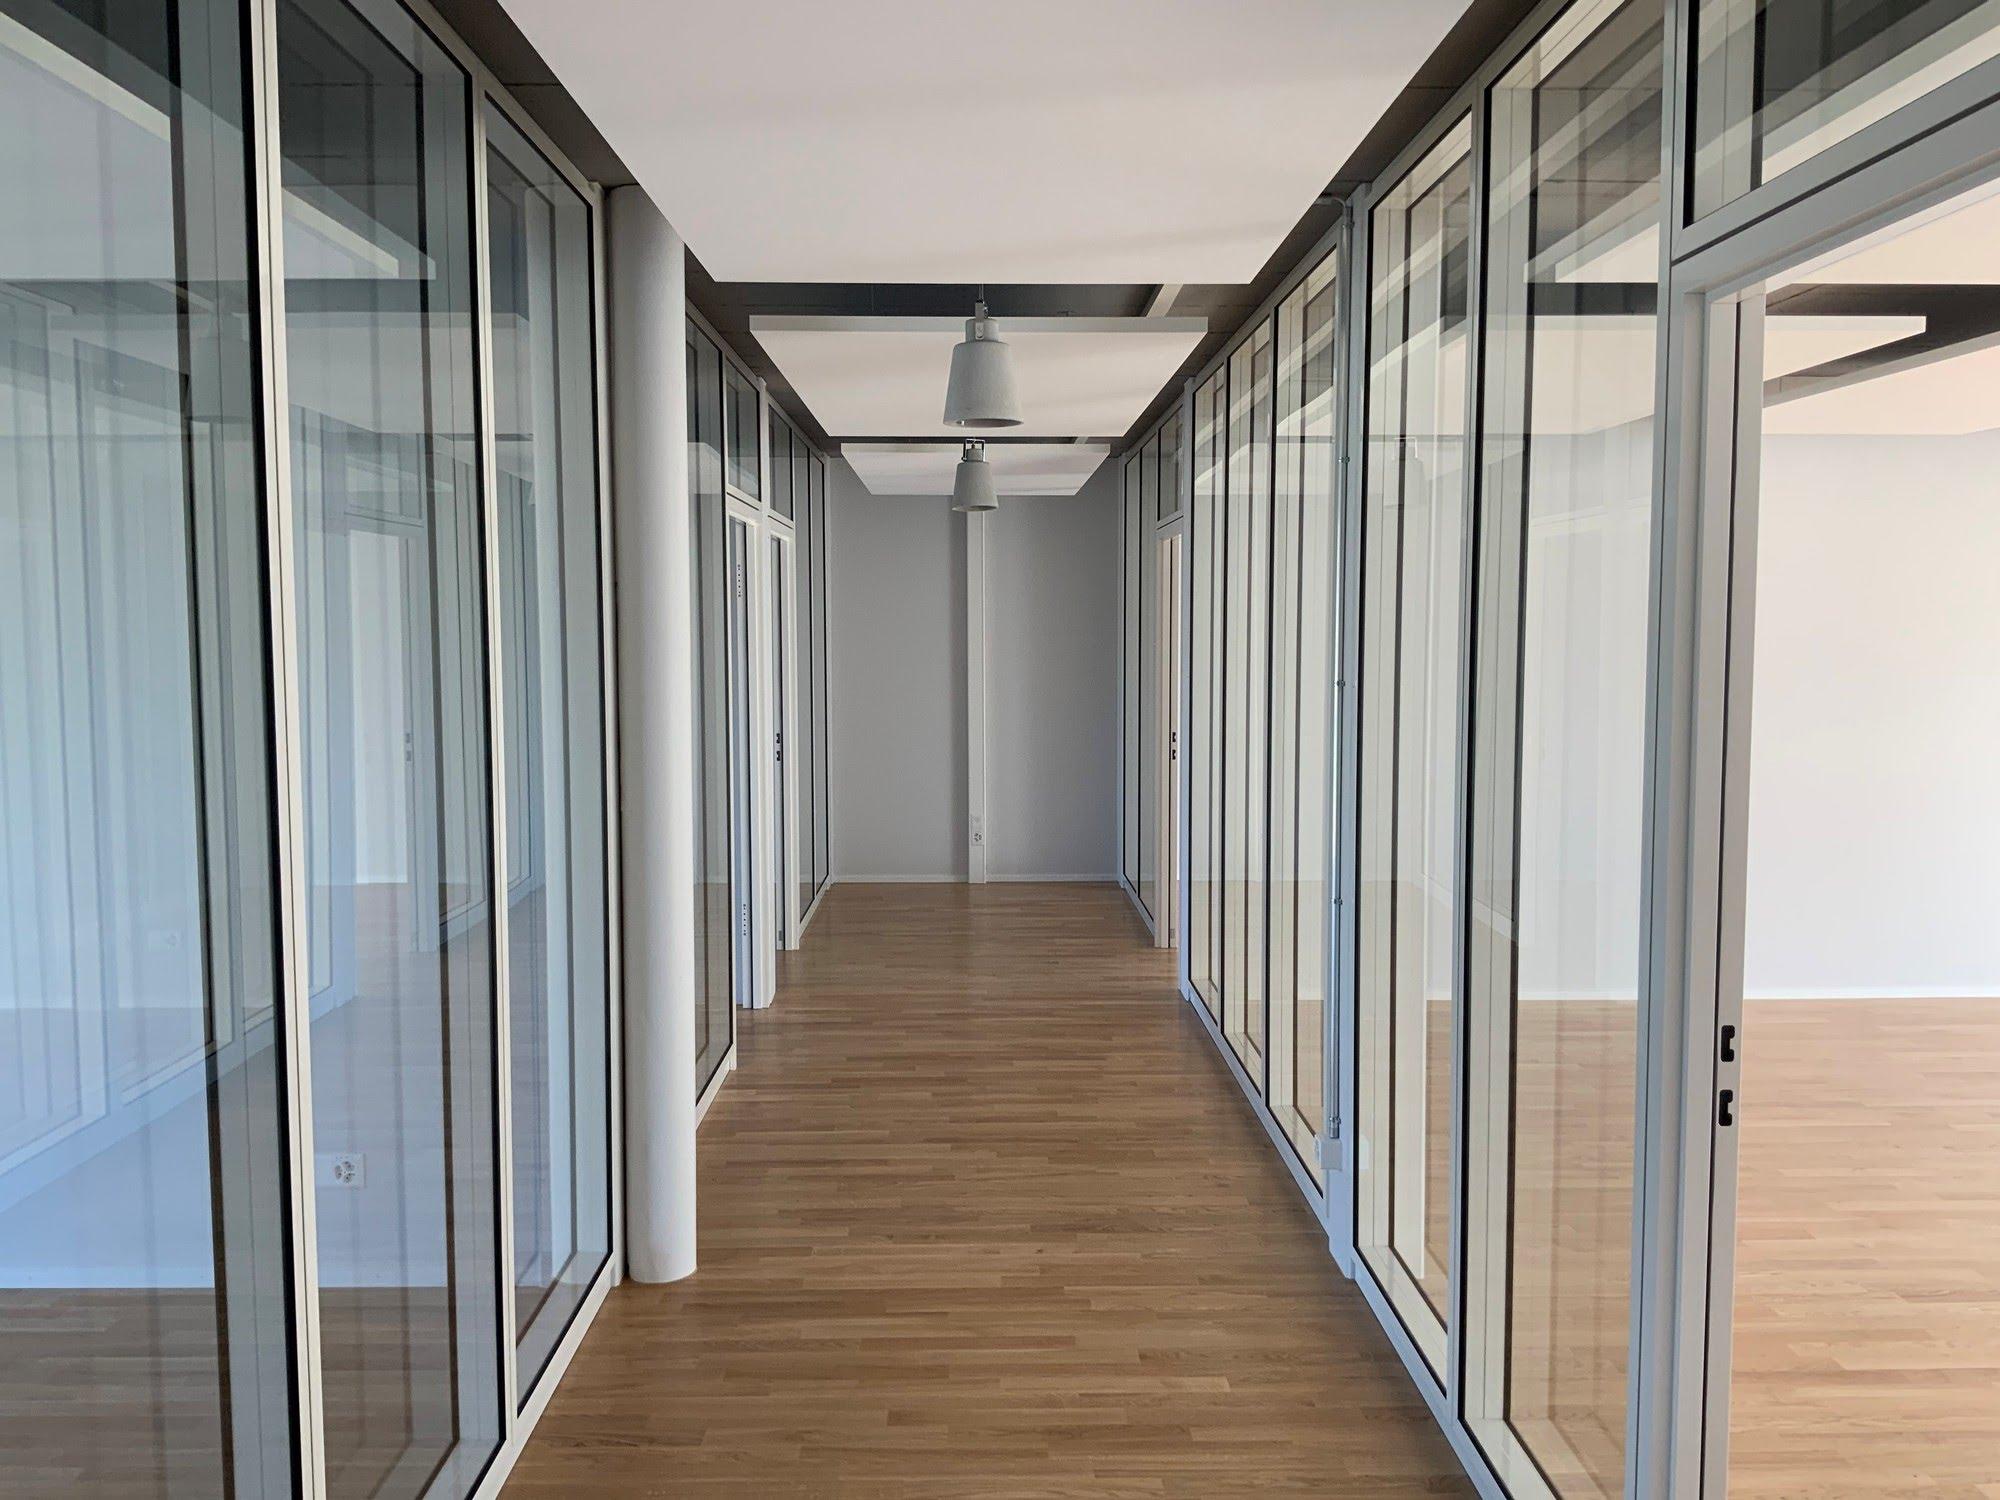 Akustik- / Schallschutzdecken,NovaFlex - Bürotrennwand,Formula V AG,Deckensystem-Wandsysteme,Trennwände Büro,Ganzglaswände,Bürotrennwand,Akustikdecken,Schallschutzdecken,Trennwände,Glaswände,Faltwände,Raumgestaltung,Trennwand Systeme